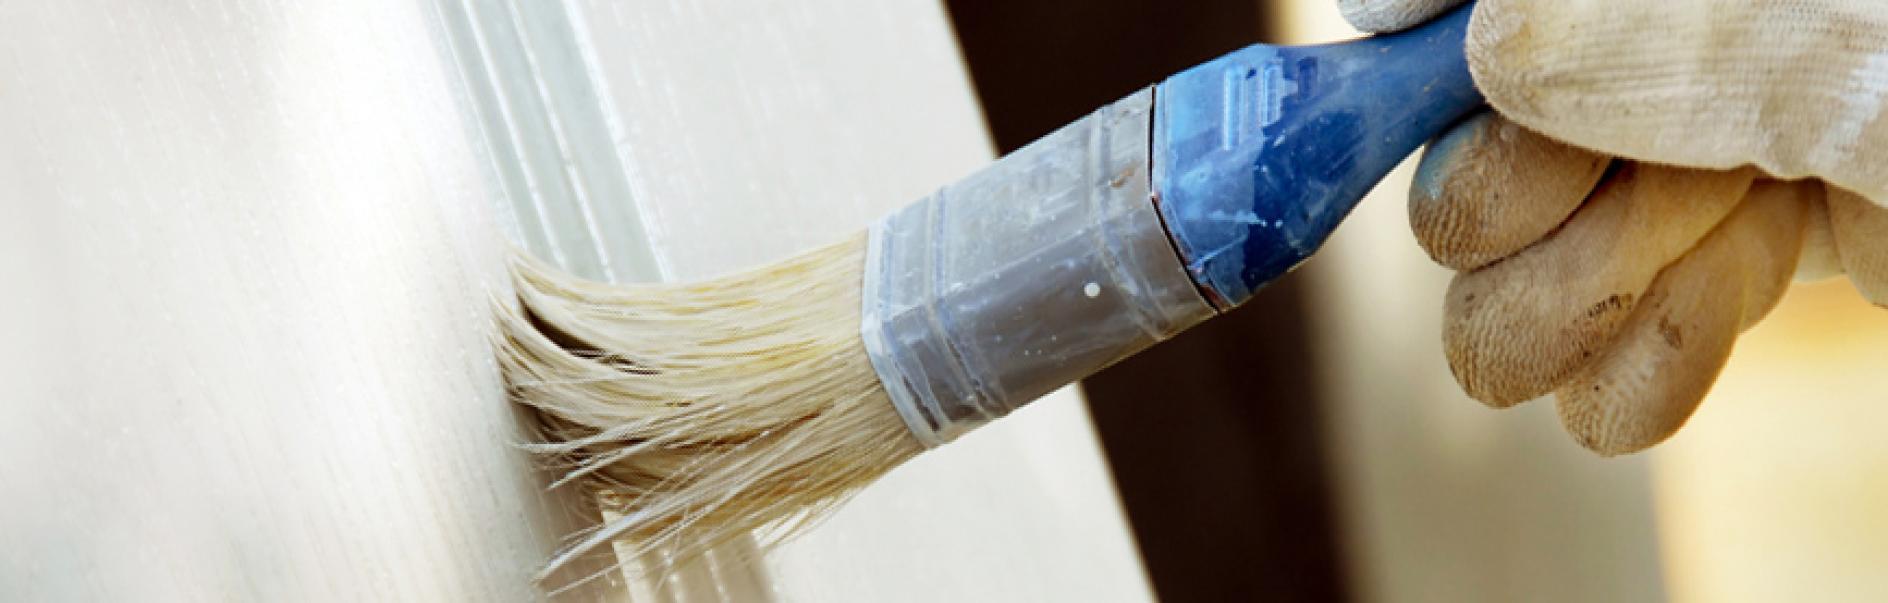 Pintar el marco de una ventana de madera